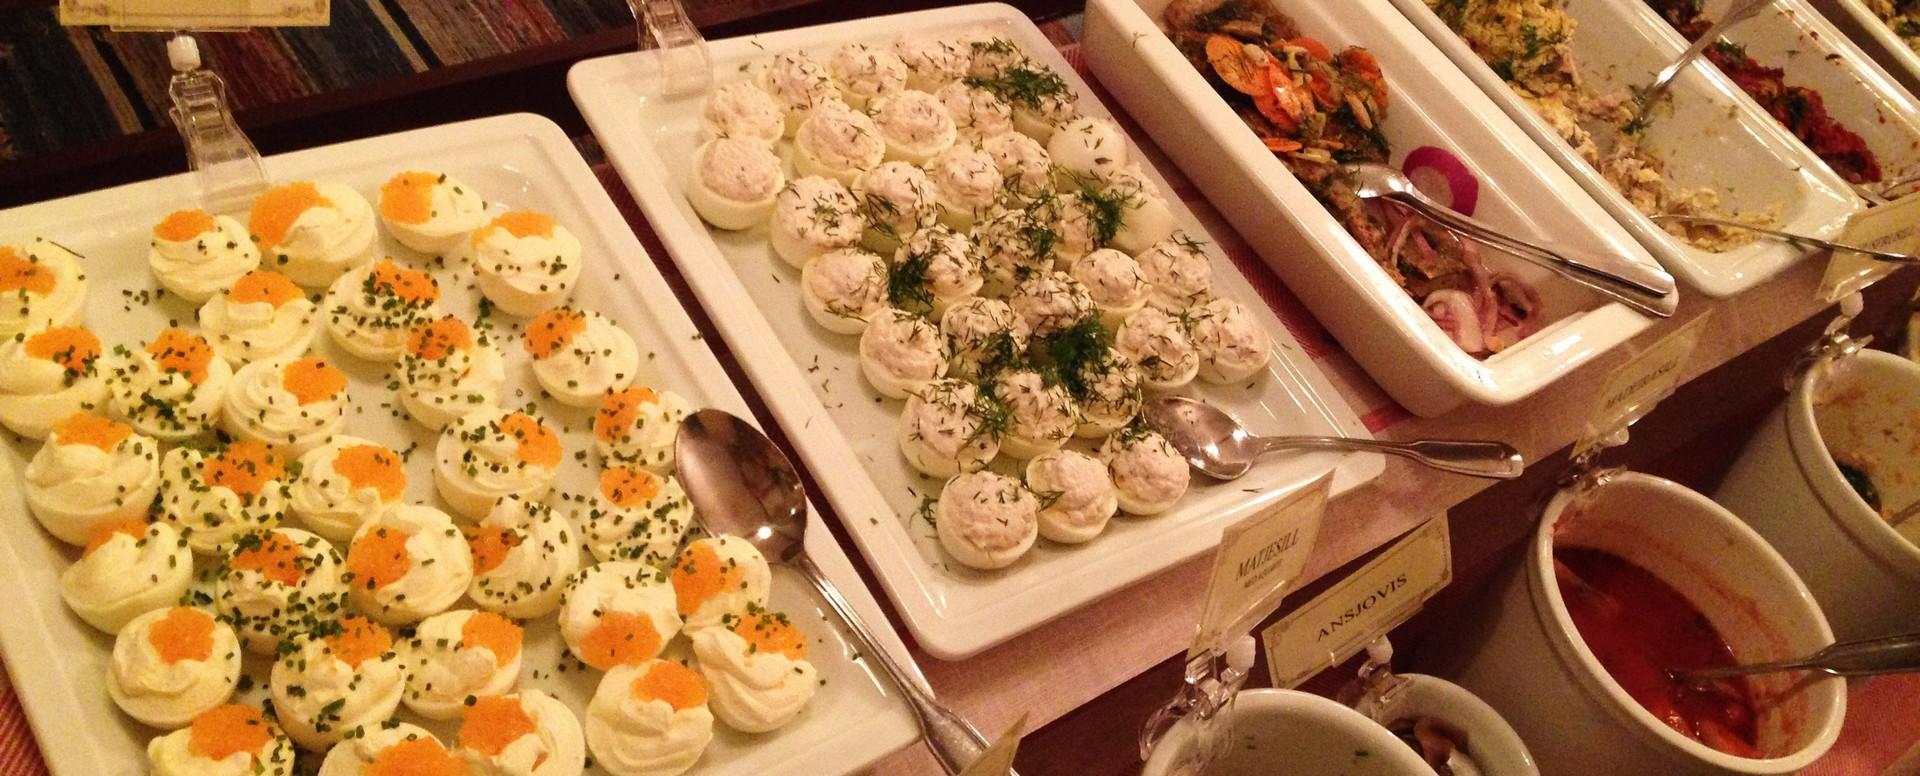 The Swedish Julbord – Christmas Buffet